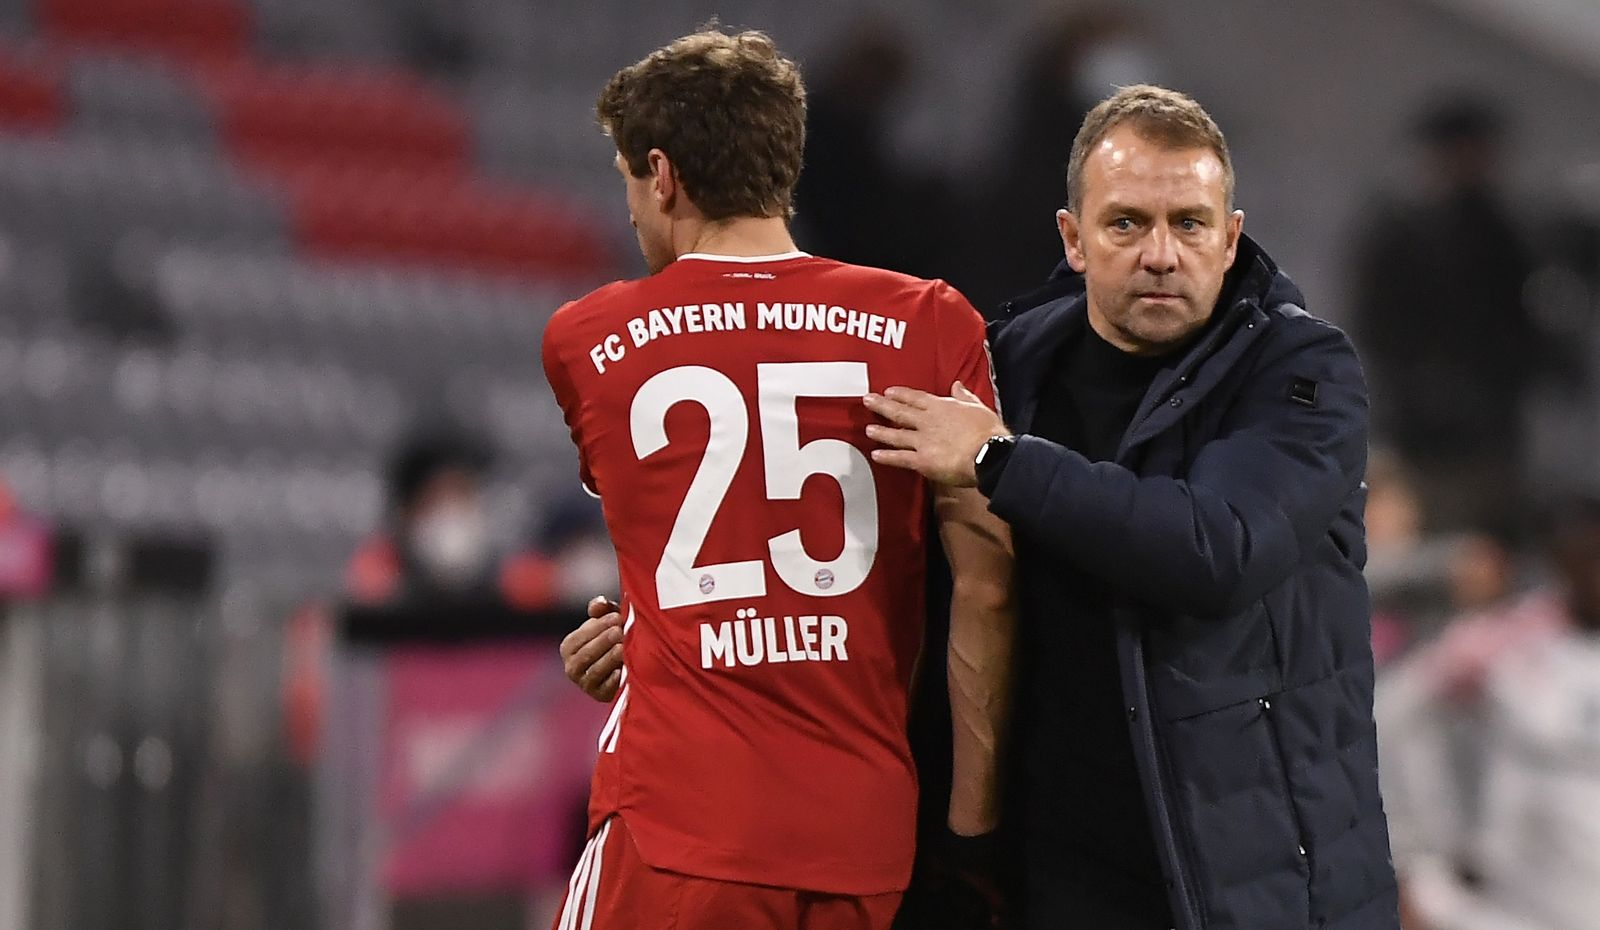 FC Bayern Muenchen vs 1. FSV Mainz 05, Munich, Germany - 03 Jan 2021